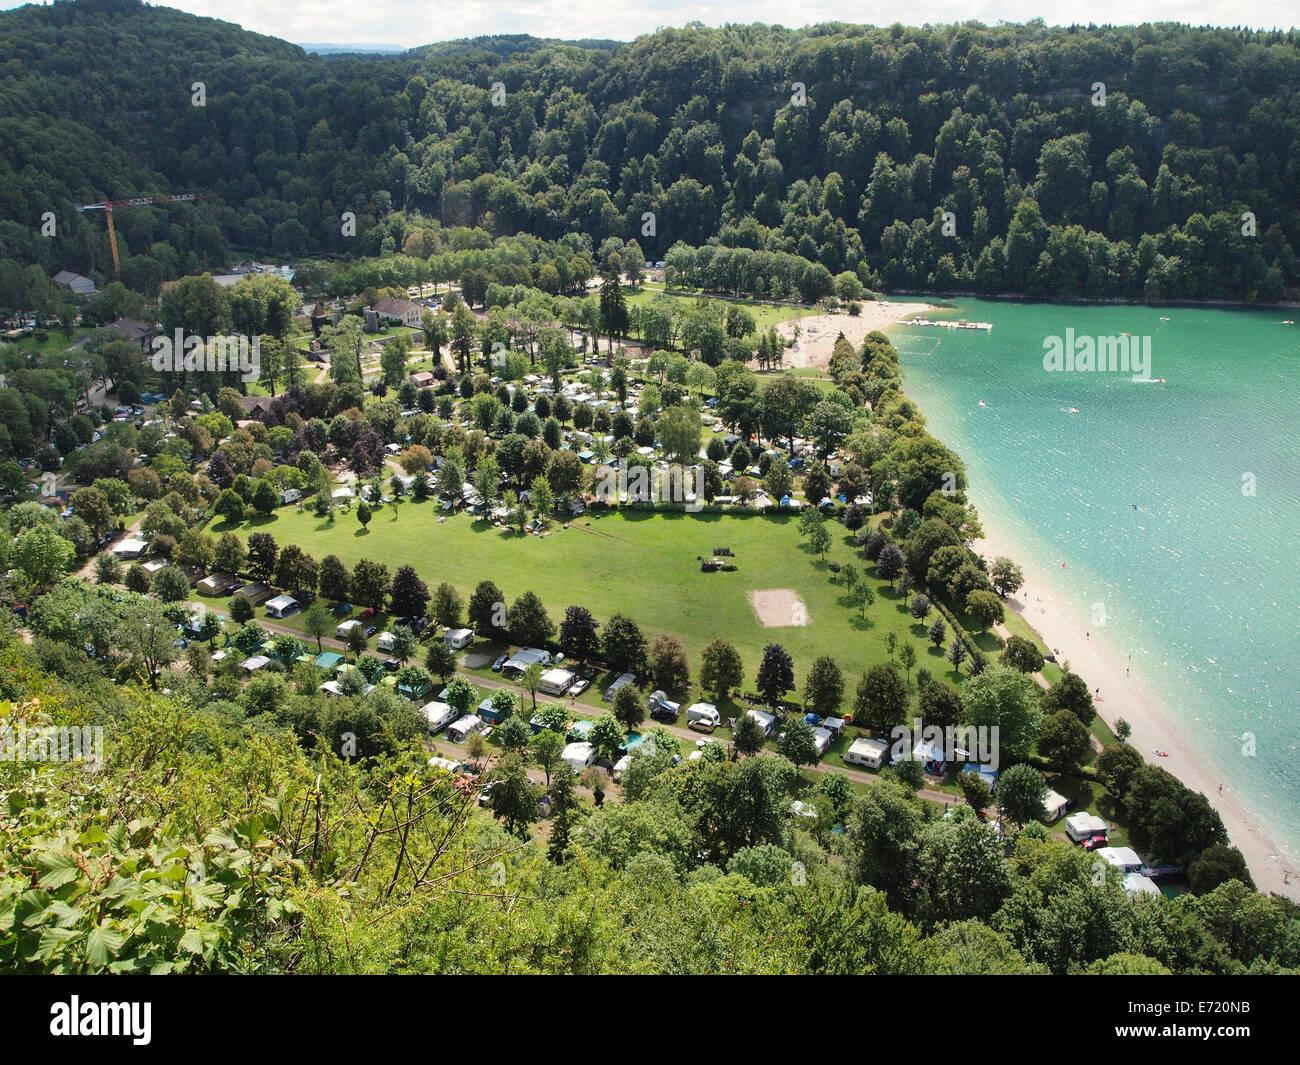 Domaine de Chalain camping site on Lac de Chalain lake, Jura, France - Stock Image